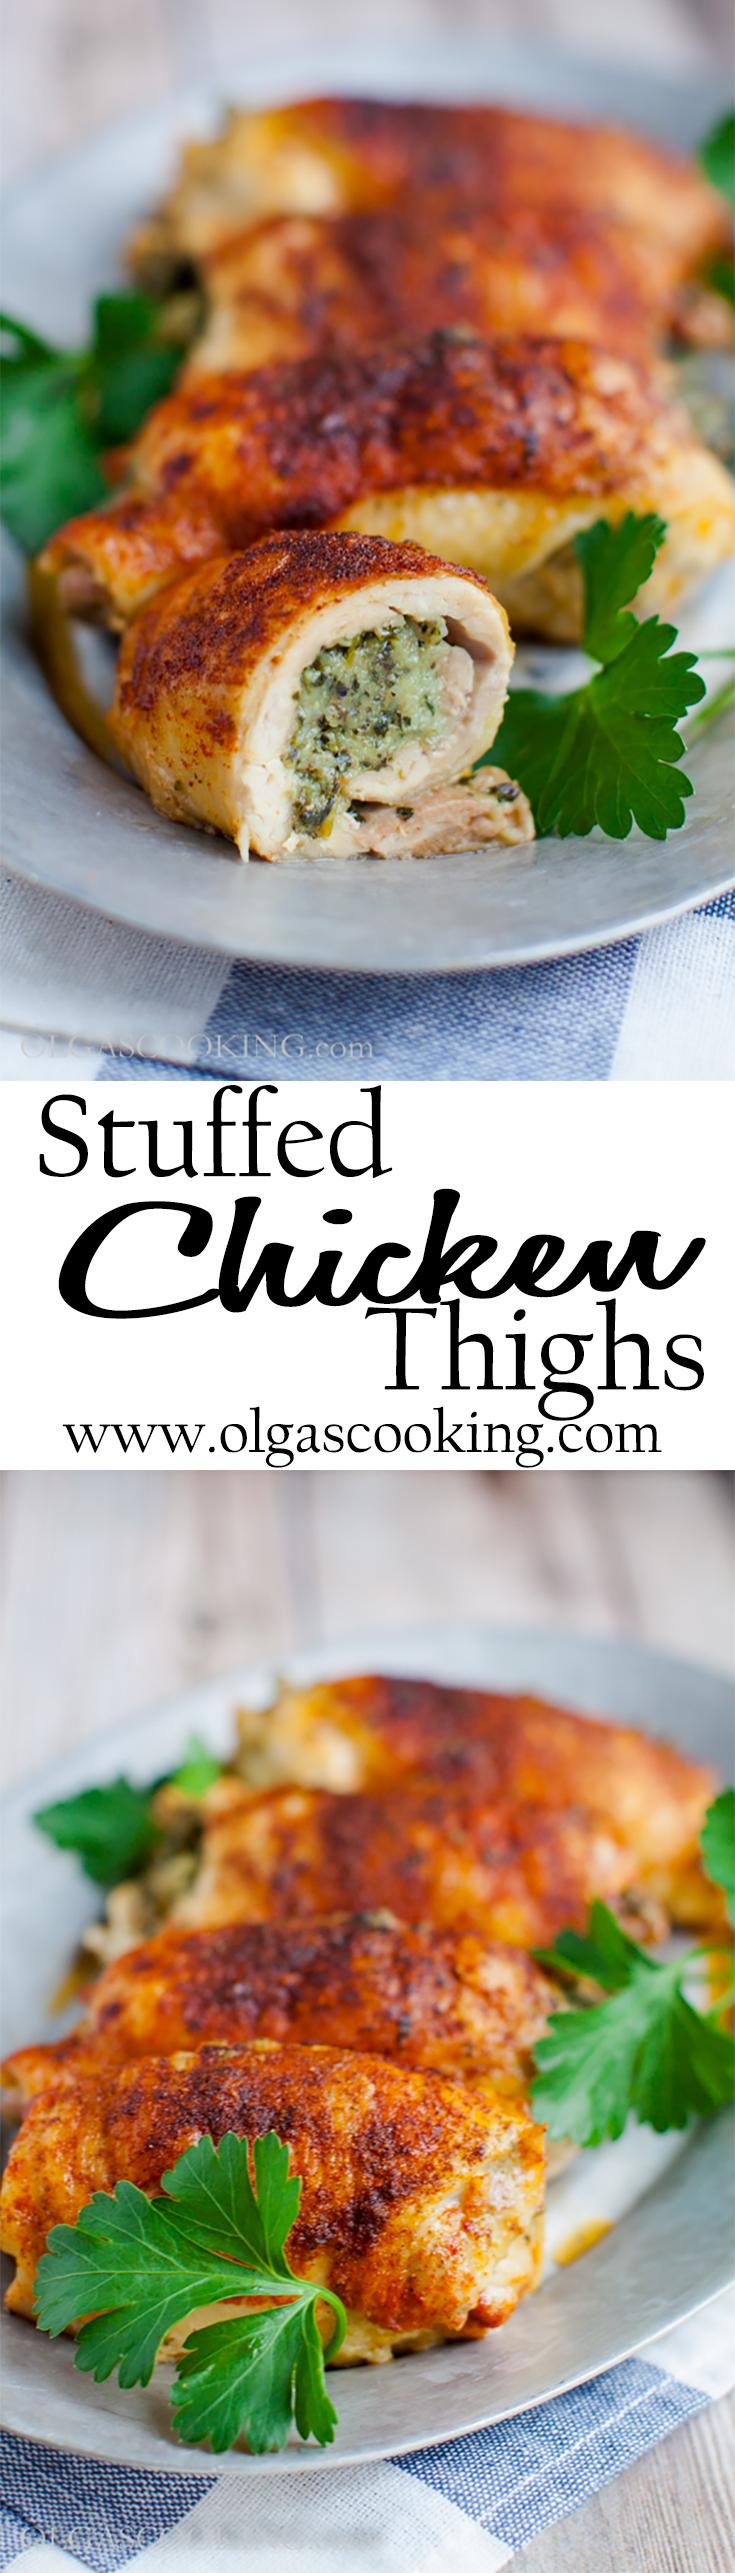 Stuffed Chicken Thighs